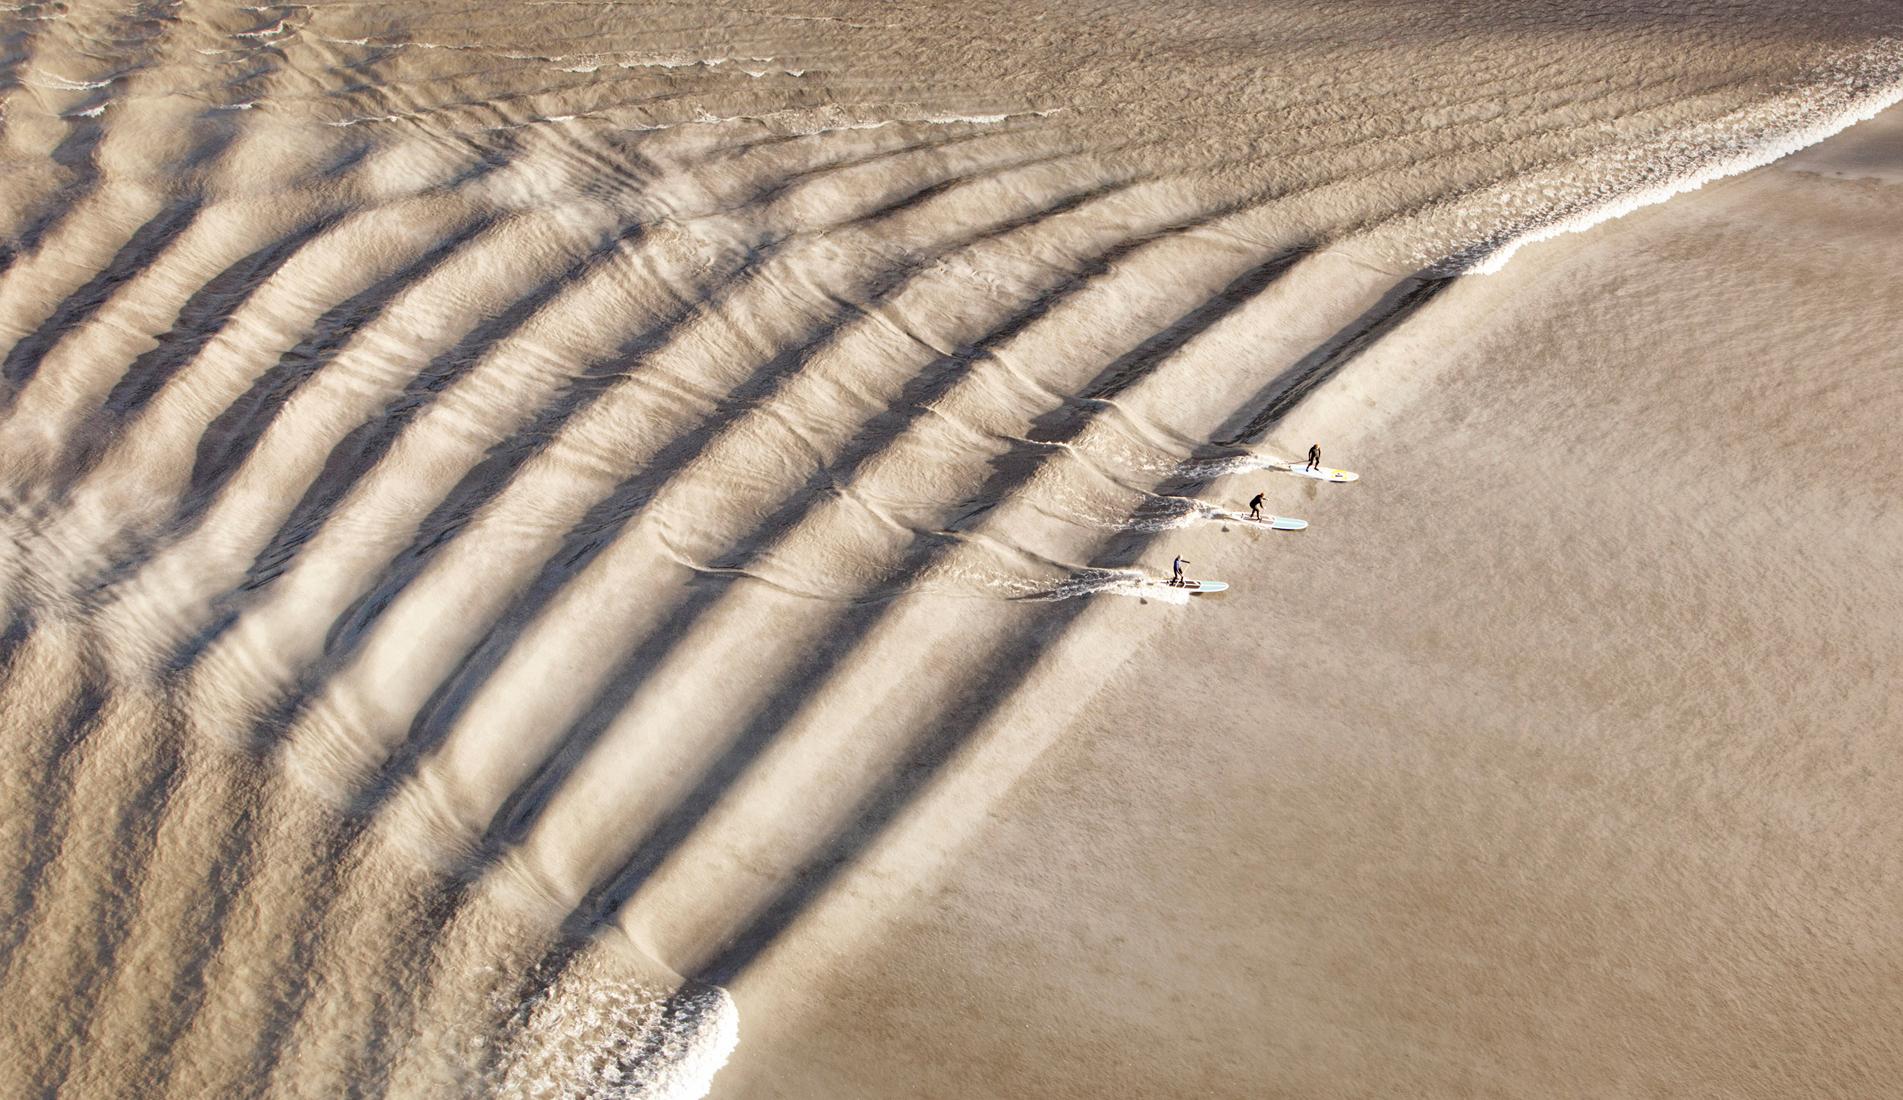 fotos-adrenalina-watersports-8